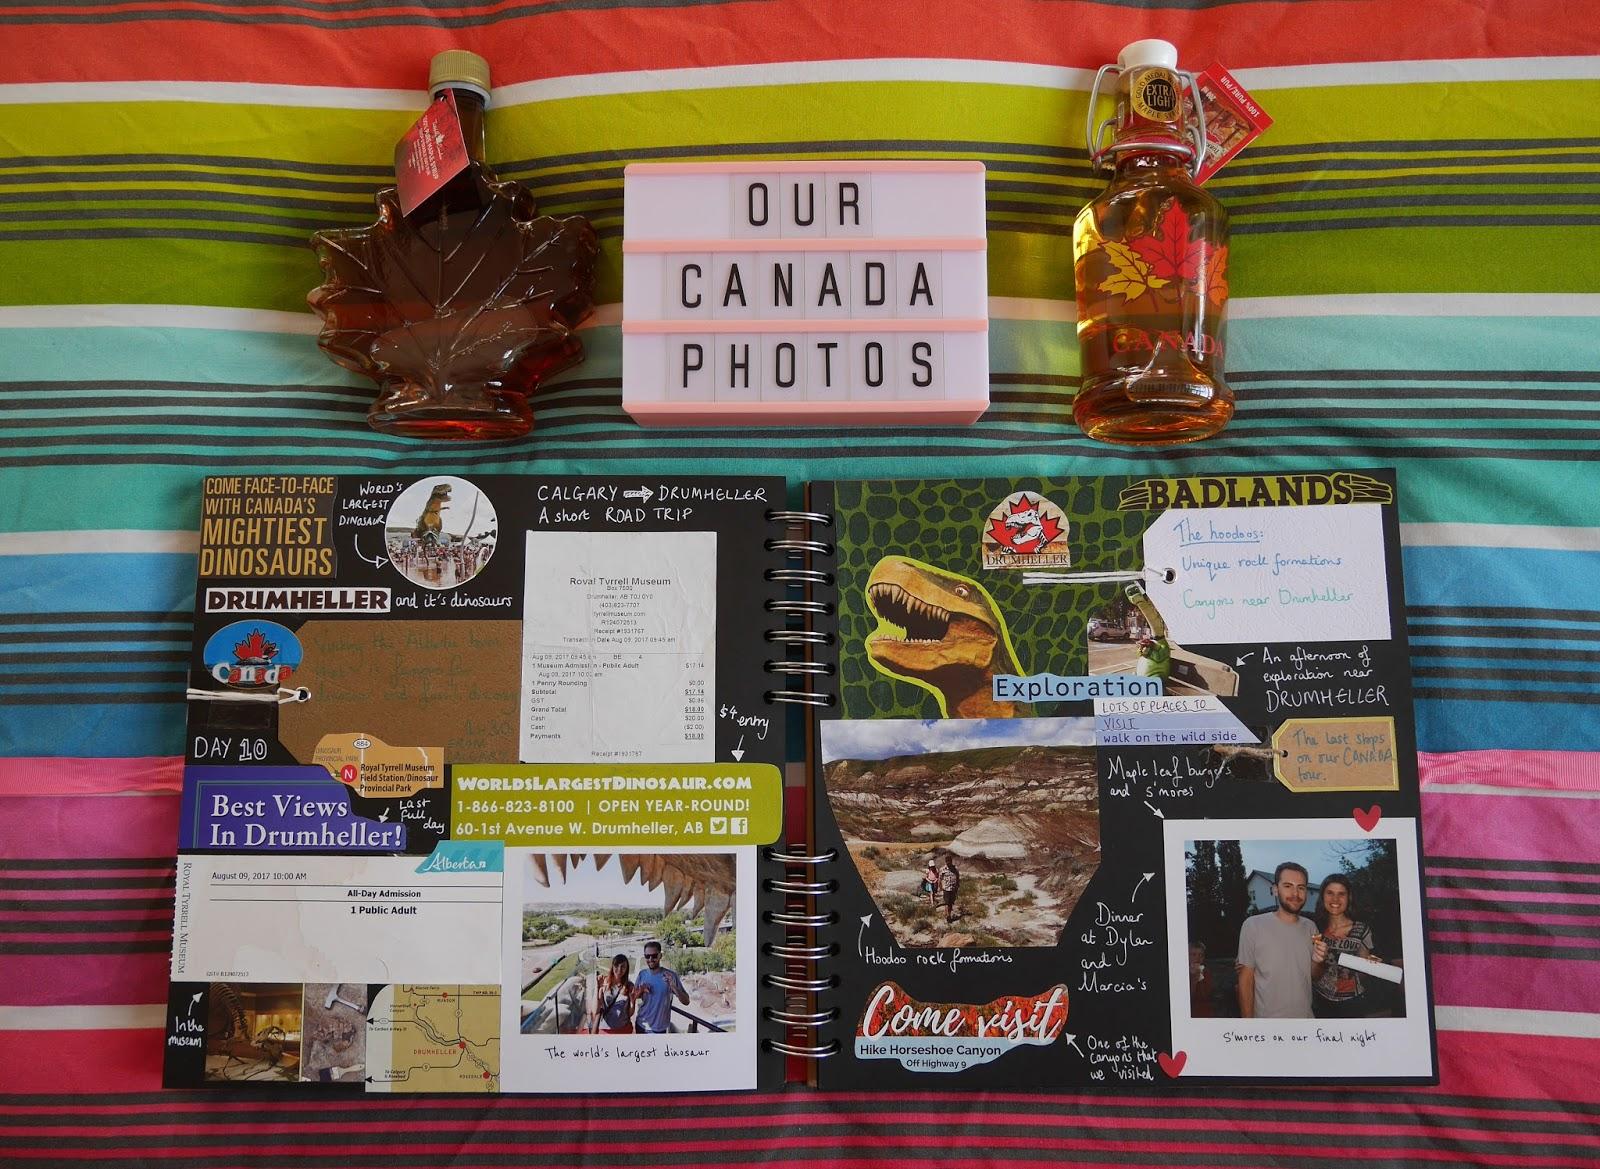 Canada travel scrapbook pages 13-14 (Drumheller) featuring Printiki's retro prints